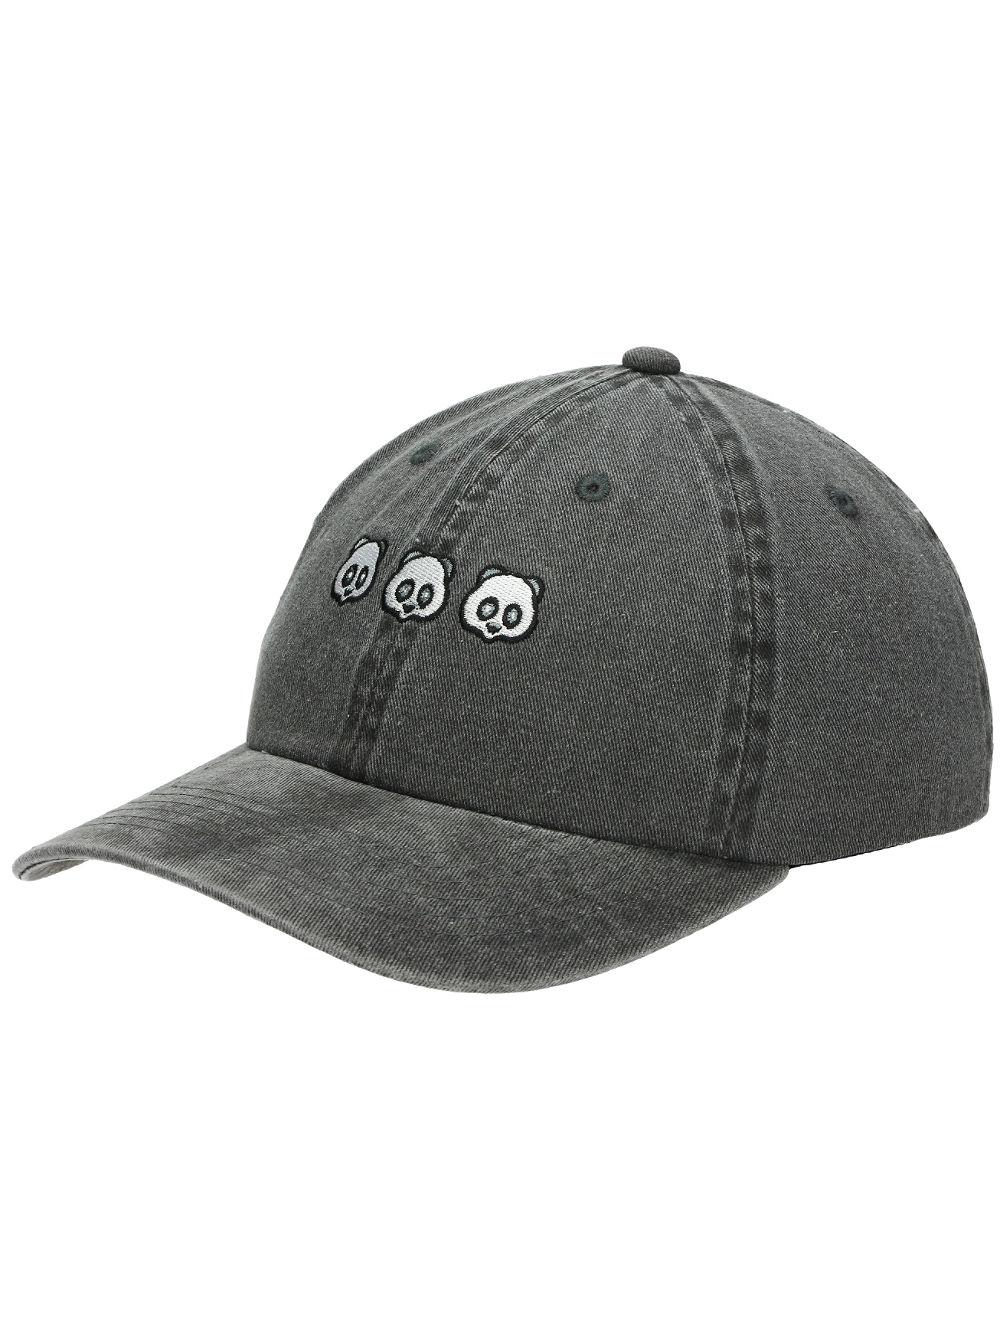 Buy empyre panda cubed cap online at blue tomato com